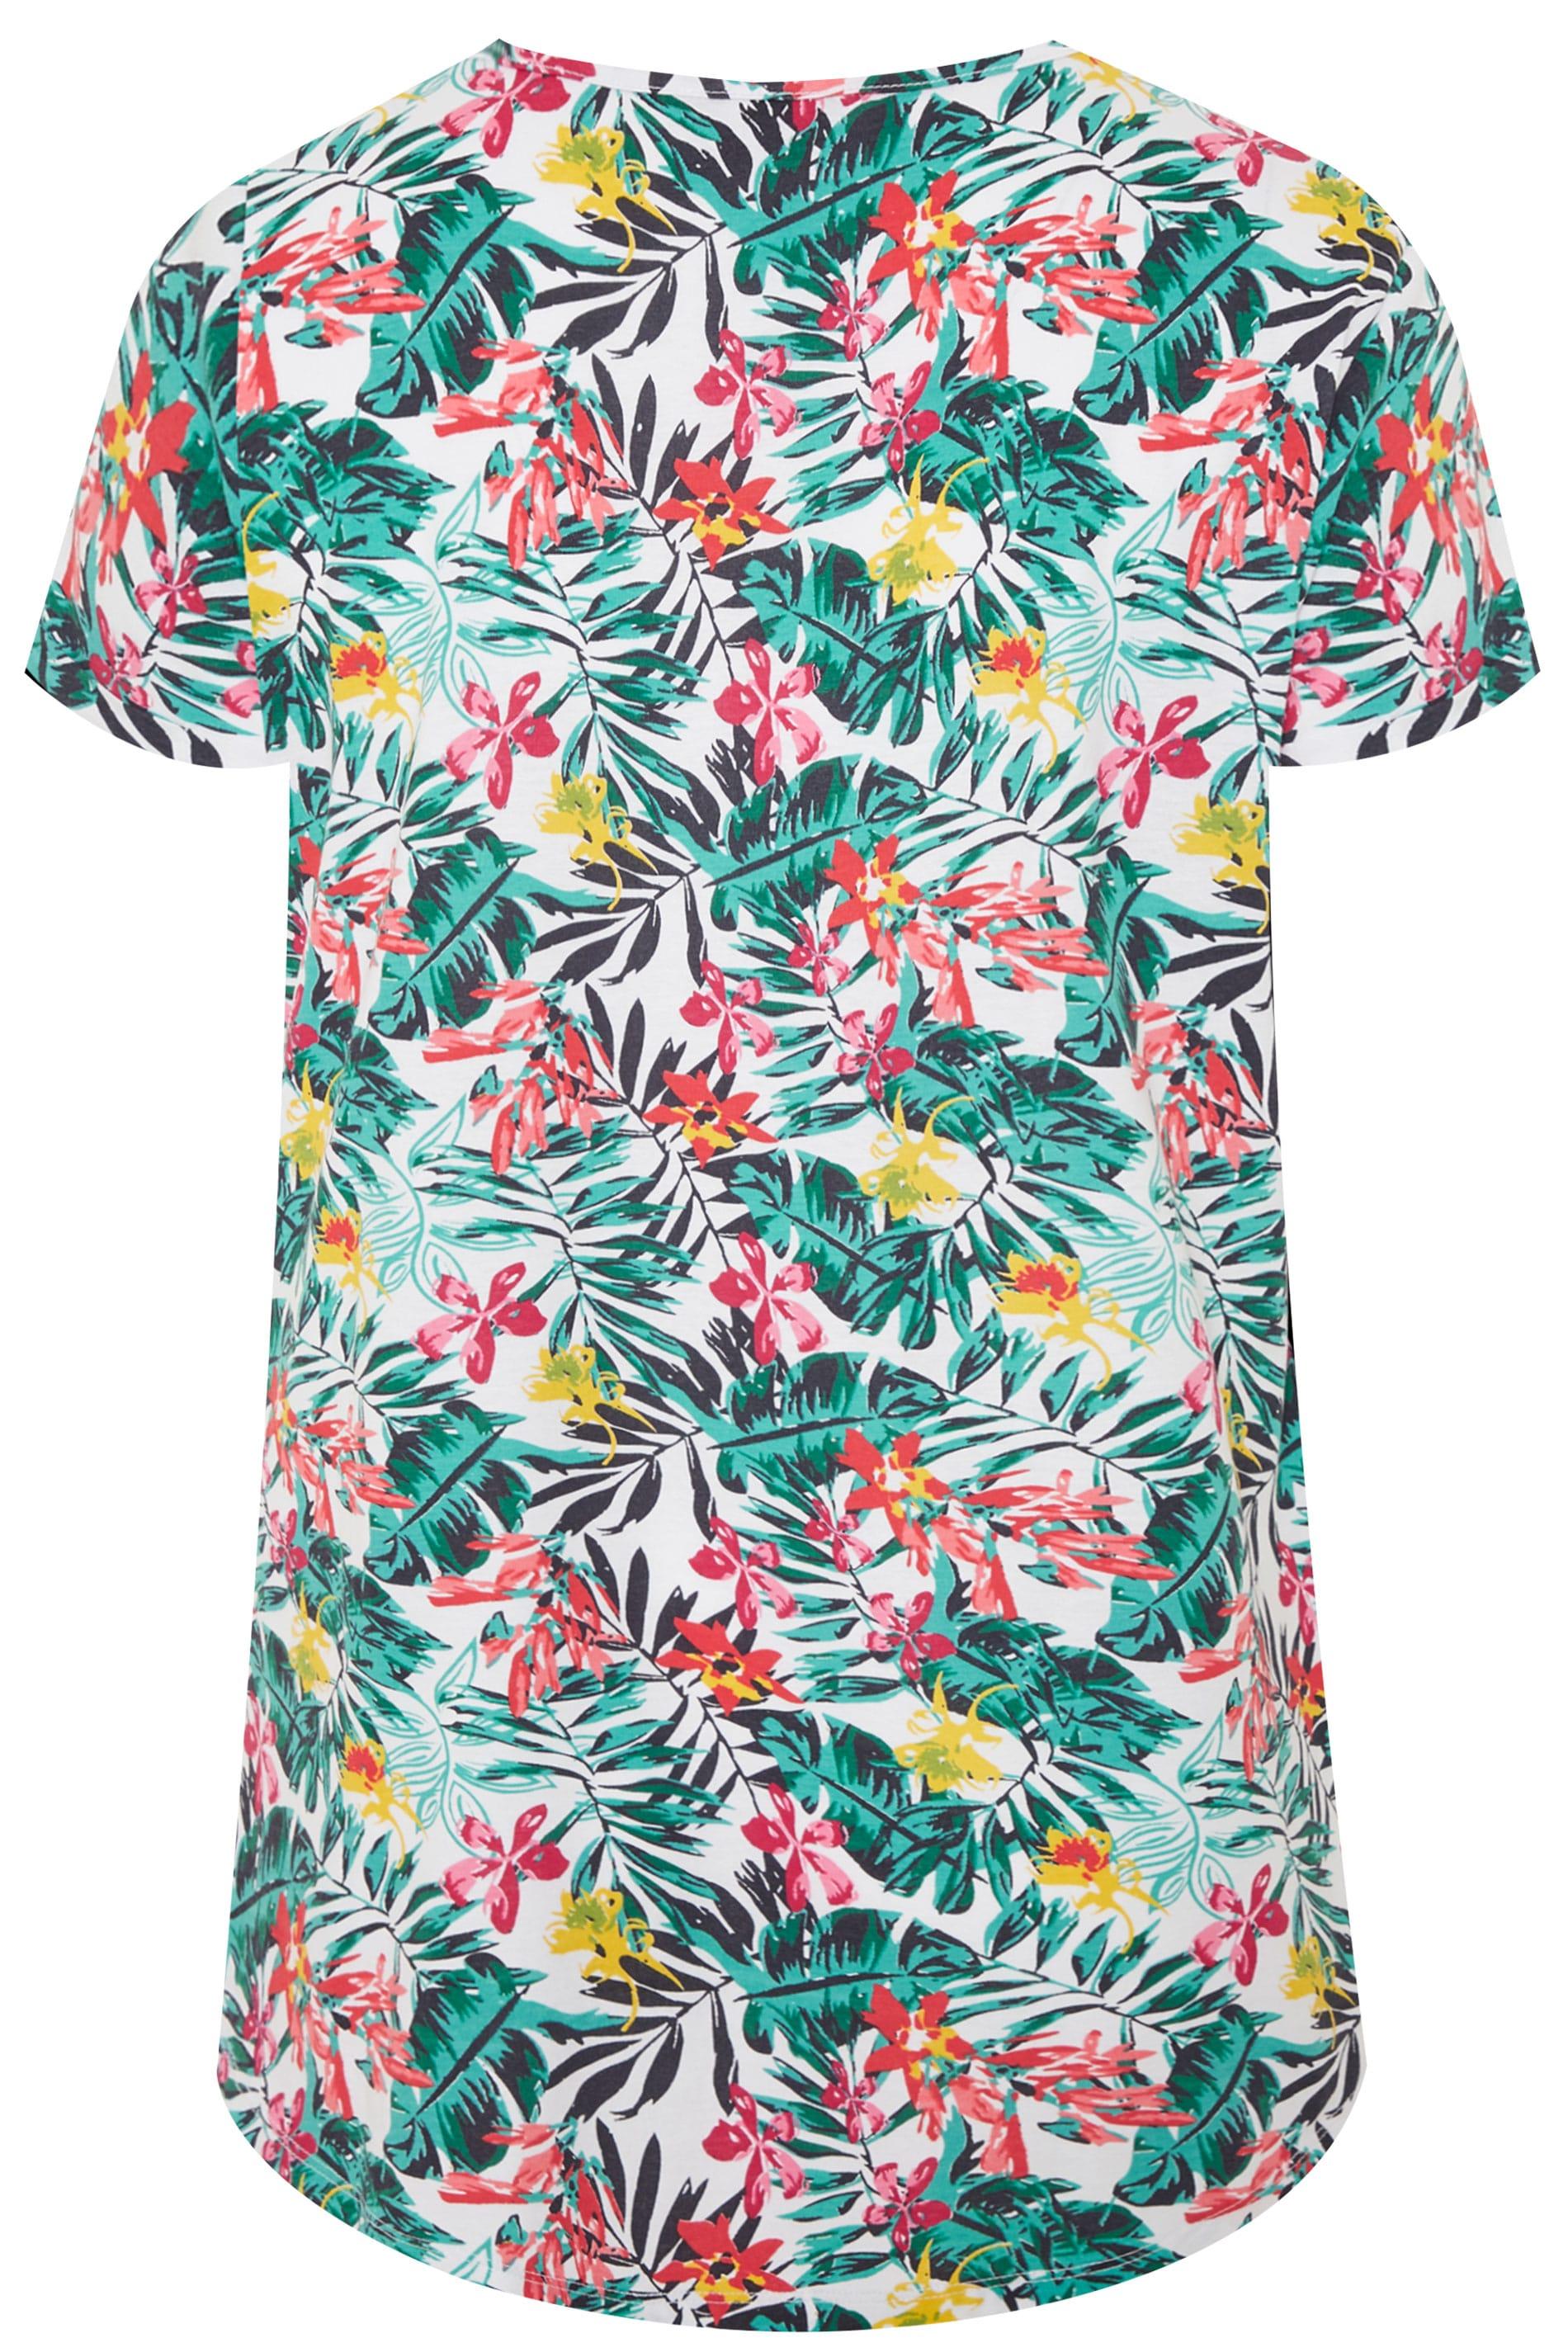 Plus Size Pink Tropical Floral Mock Pocket T-Shirt   Sizes